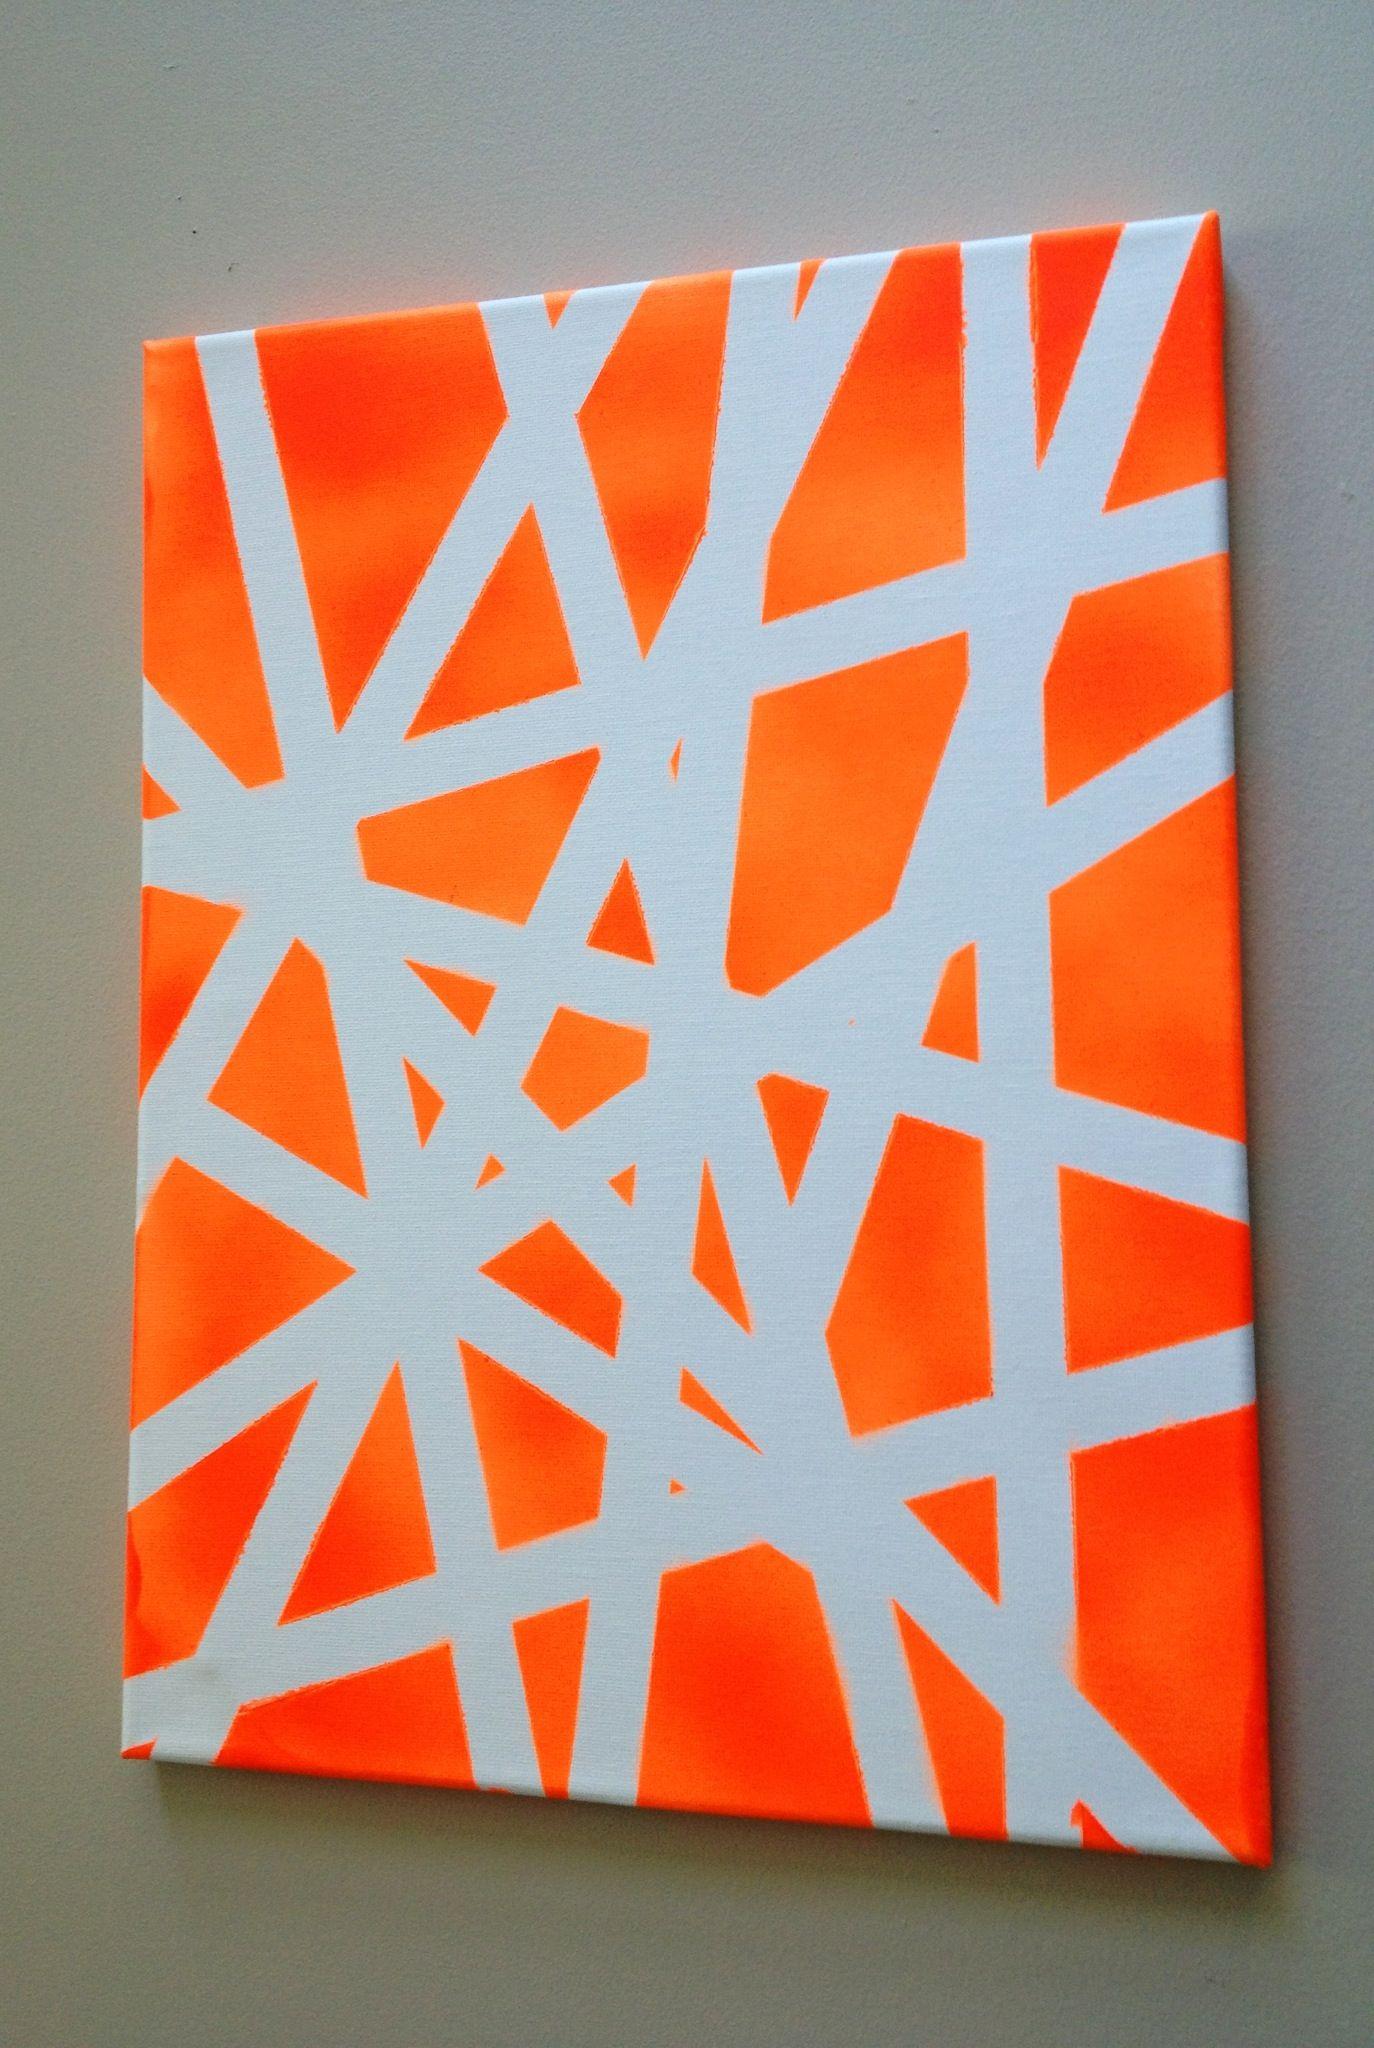 Tape Spray Paint Art Spray Paint Art Spray Paint Artwork Stencil Painting